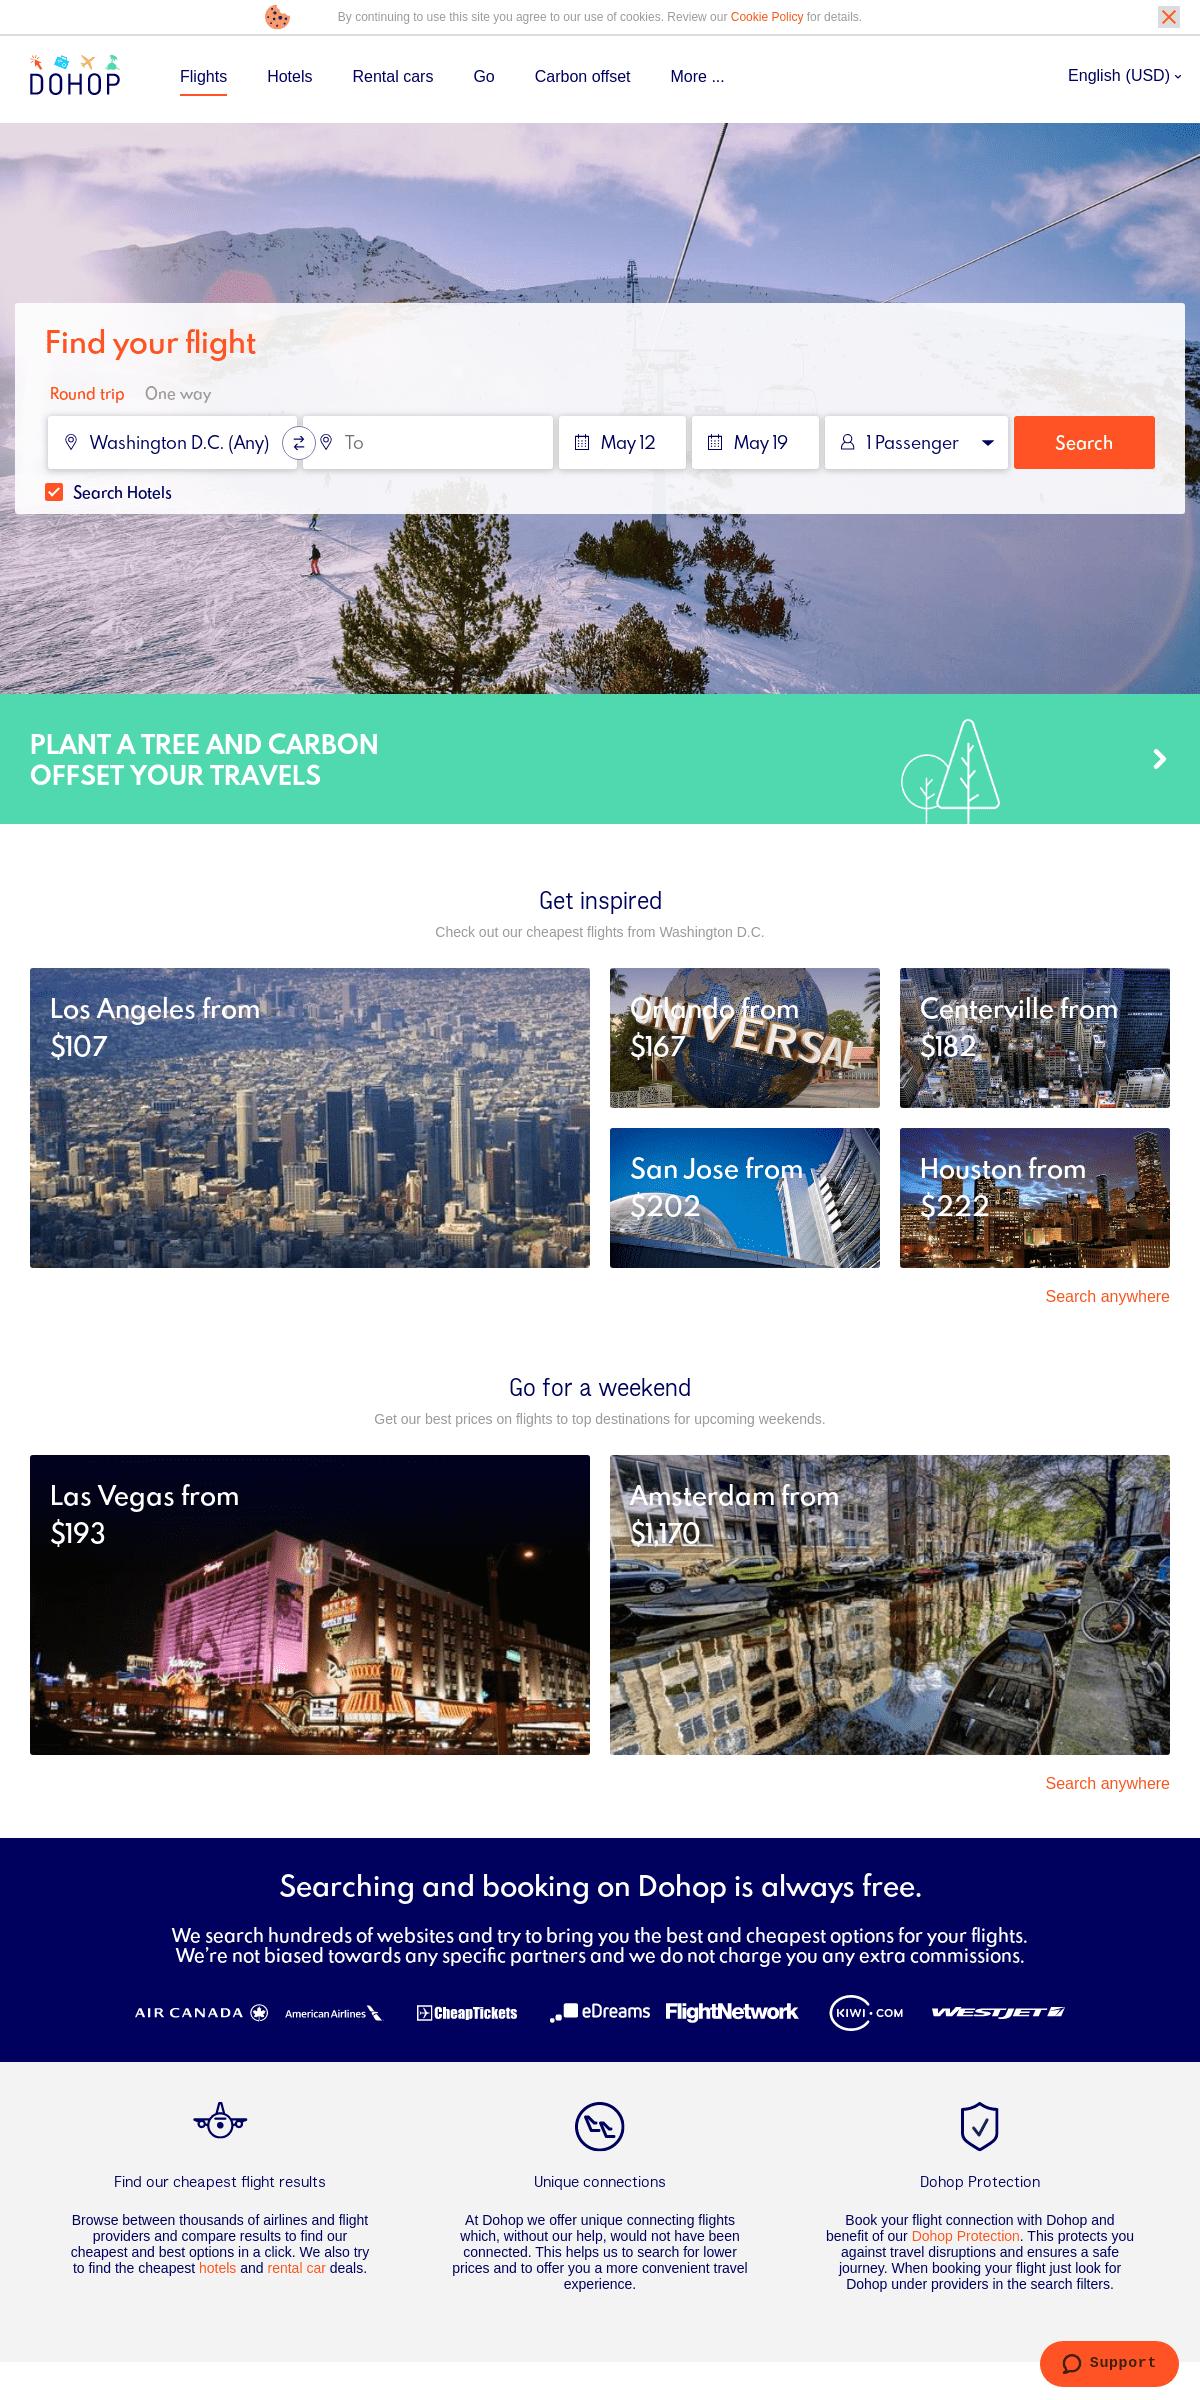 Cheap flights, Hotels and Rental cars - Dohop.com